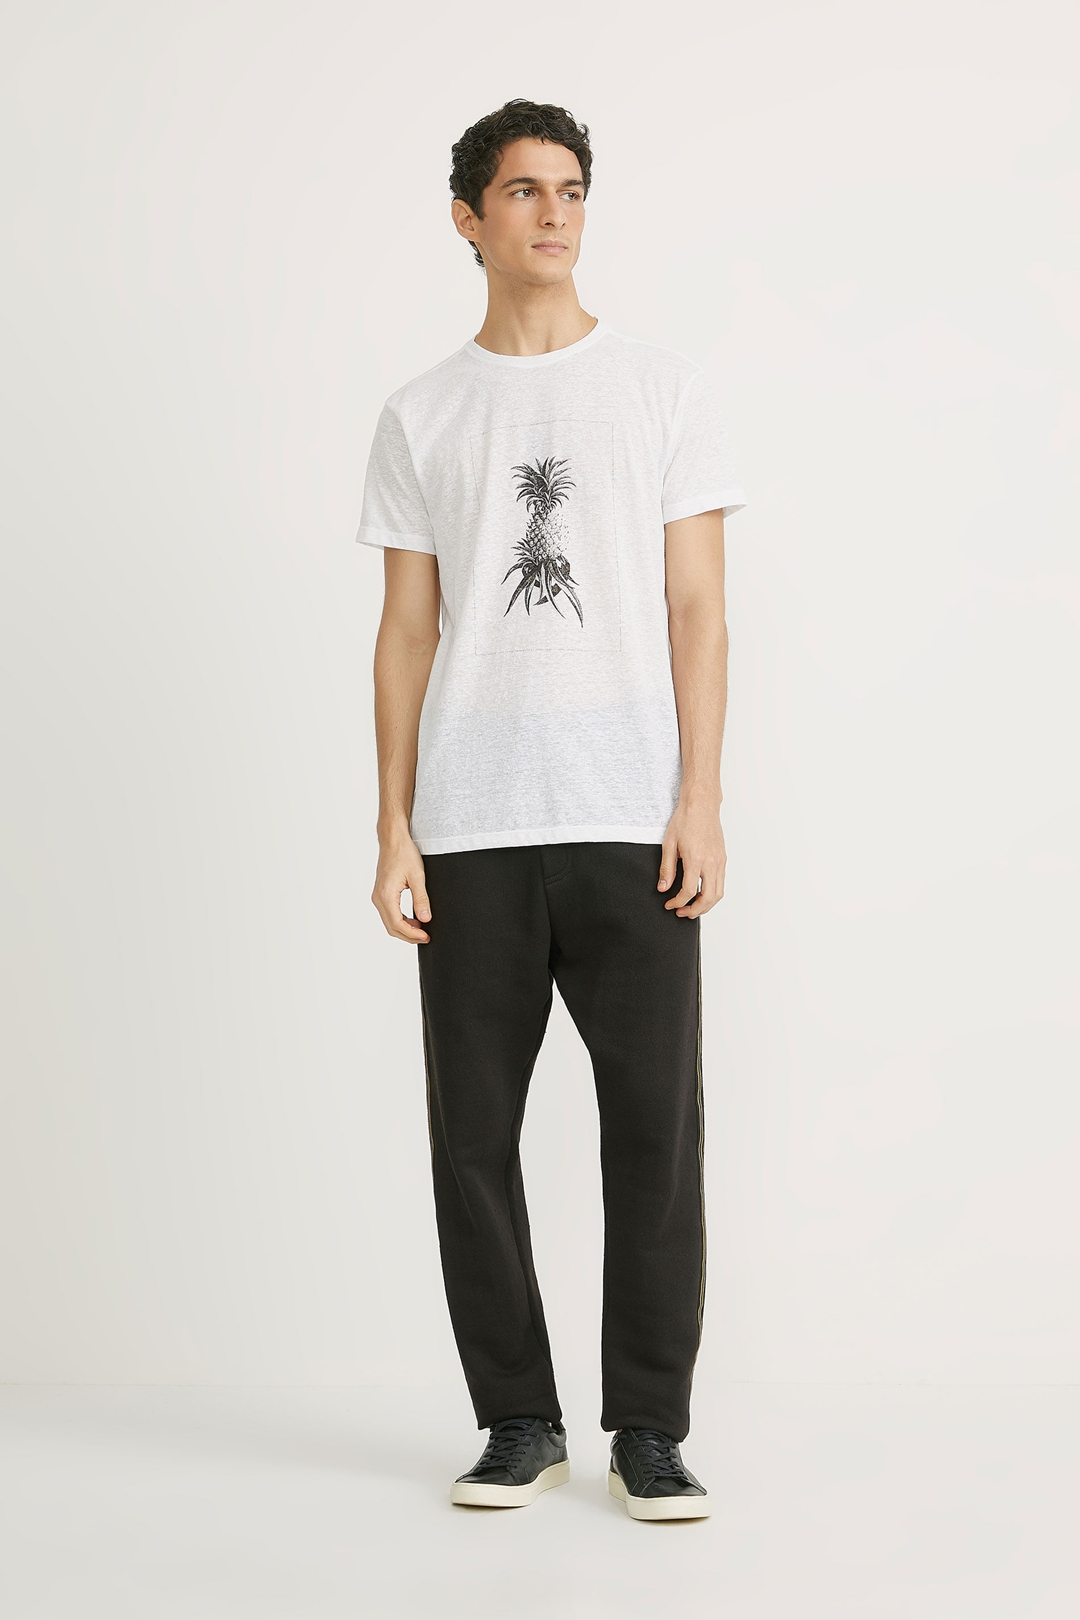 Camiseta Foxton Abacaxi Imperial - Branco